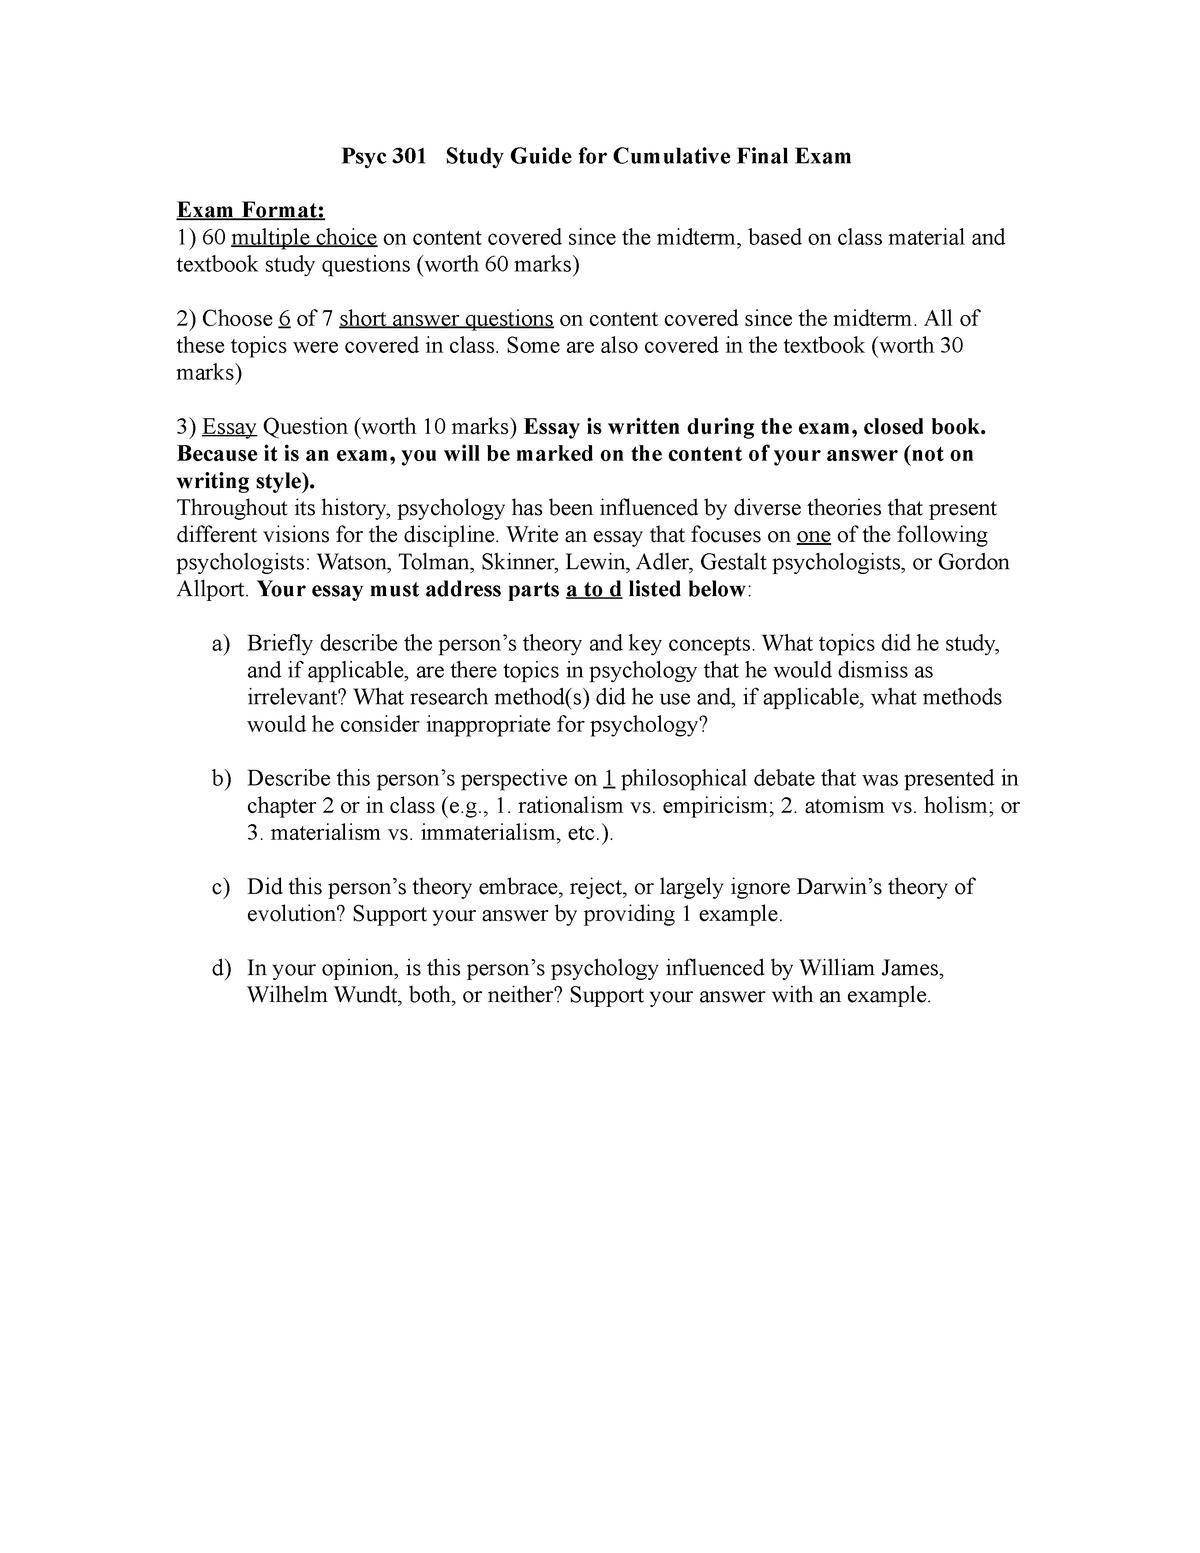 Final Exam, Practice Questions, Study Guide - PSYC 301 - StuDocu